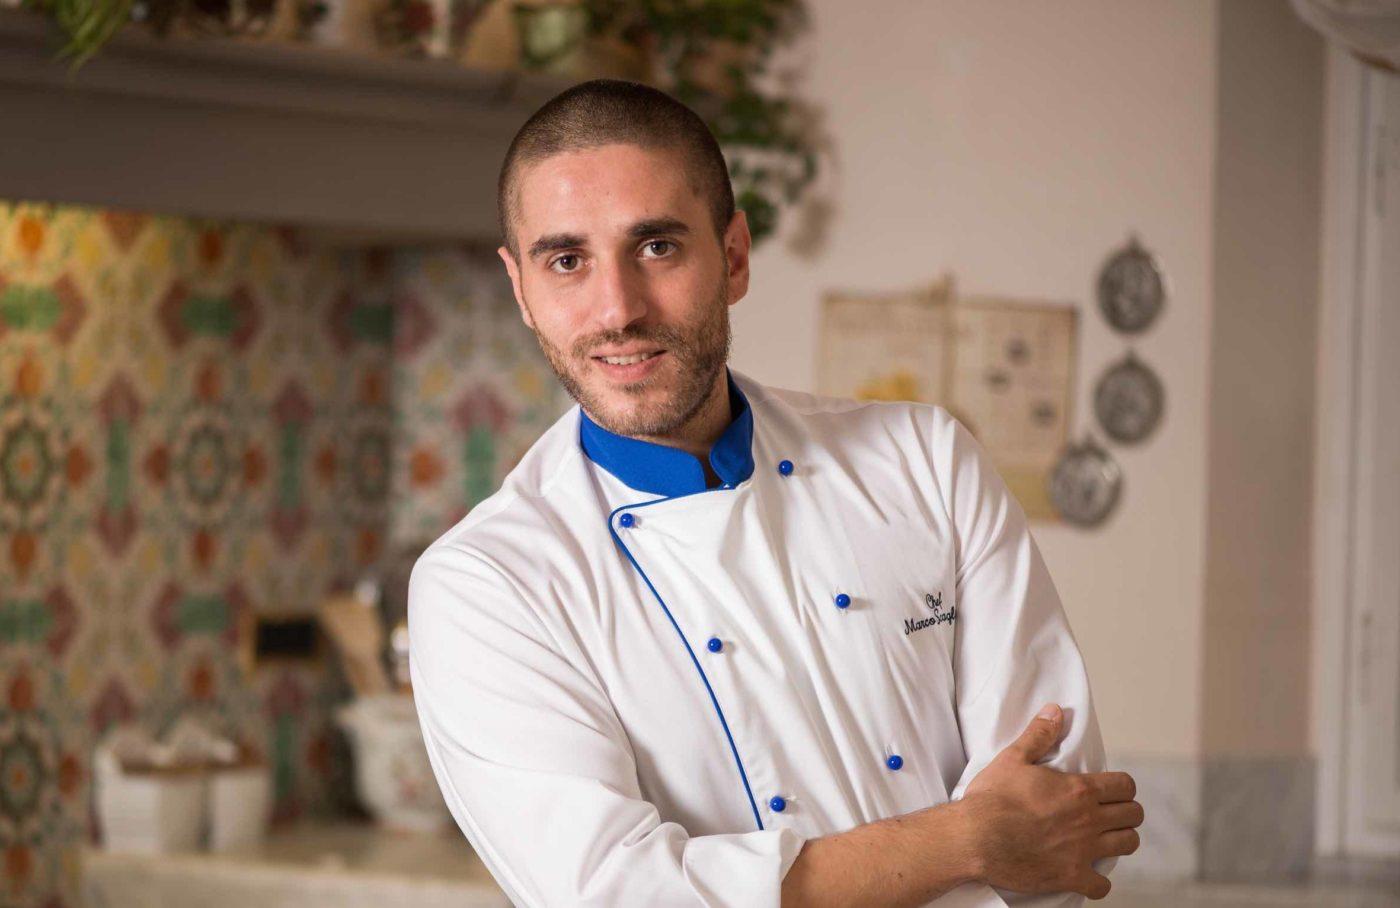 Marco Scaglione, esperto di cucina gluten free